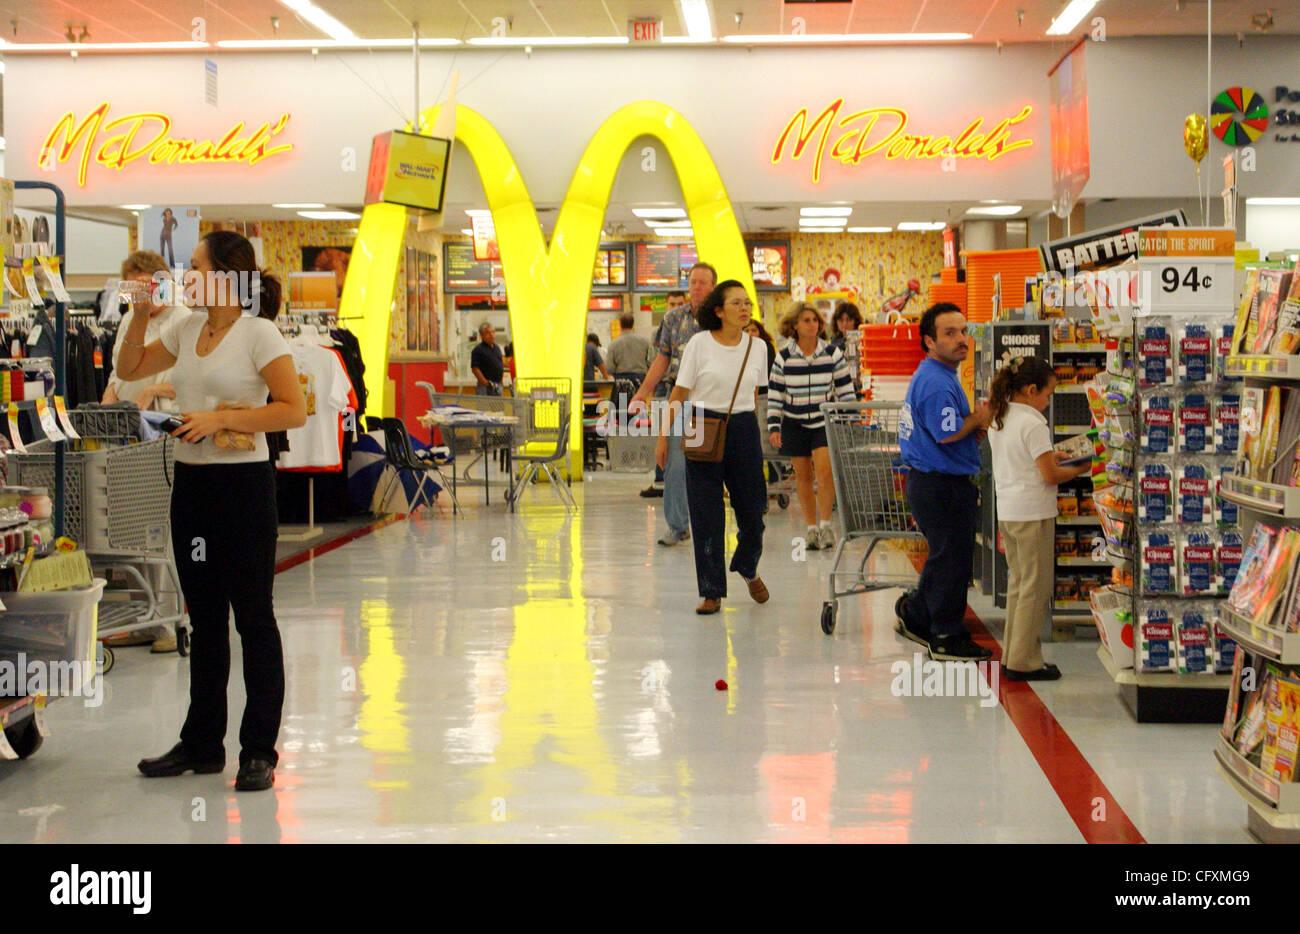 Großartig Walmart Rahmen Bilder - Benutzerdefinierte Bilderrahmen ...